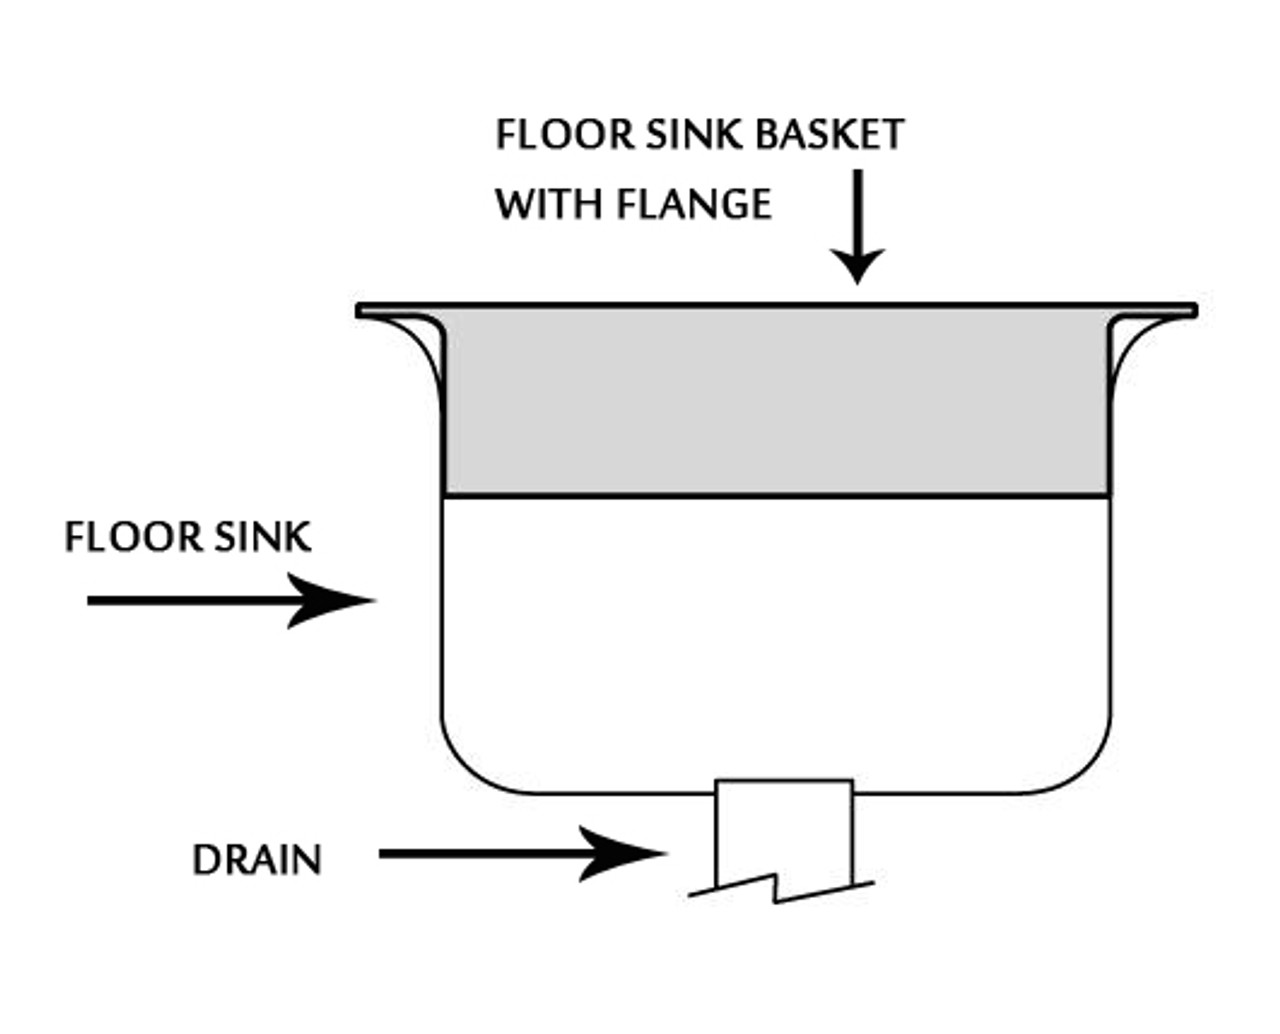 6.5 inch Basket Strainer with flange